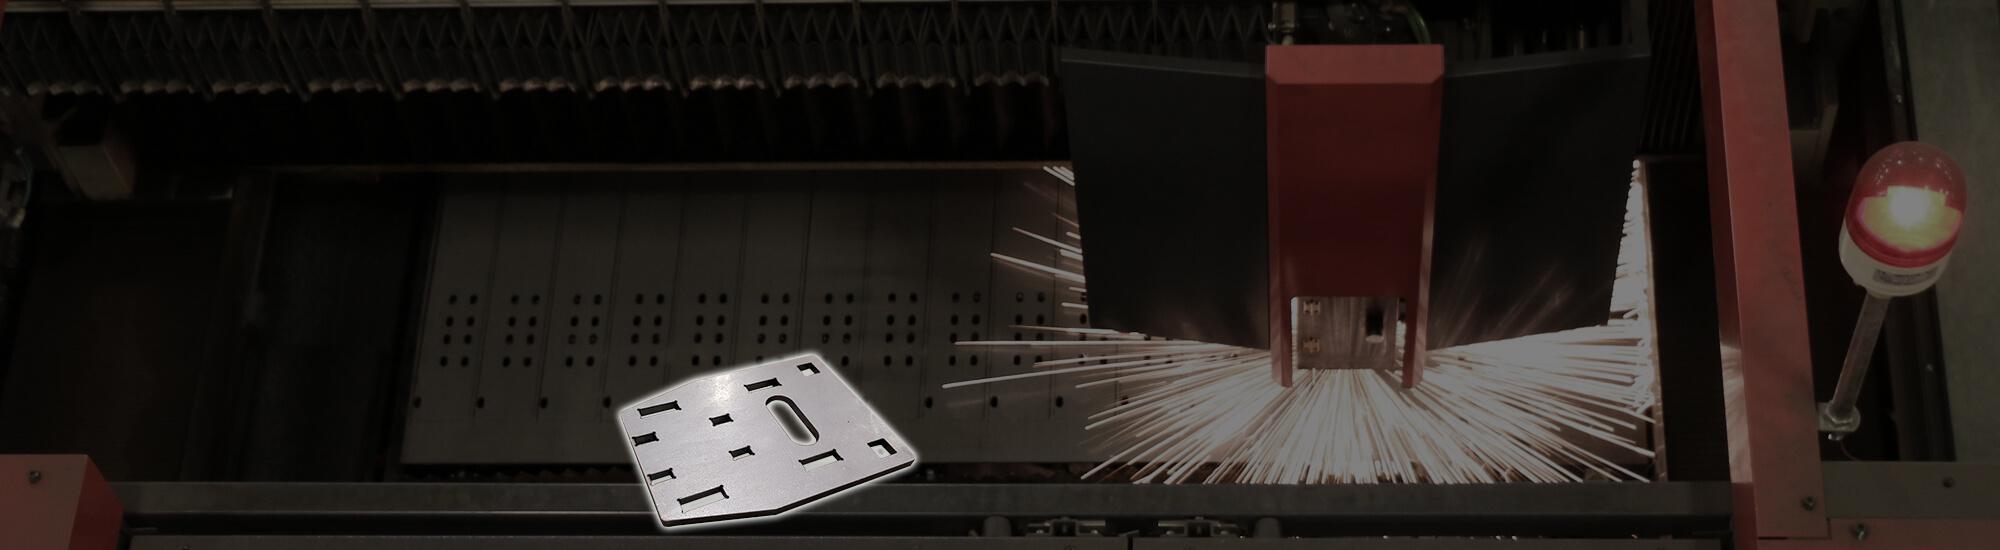 Kooima Company | Flat Laser